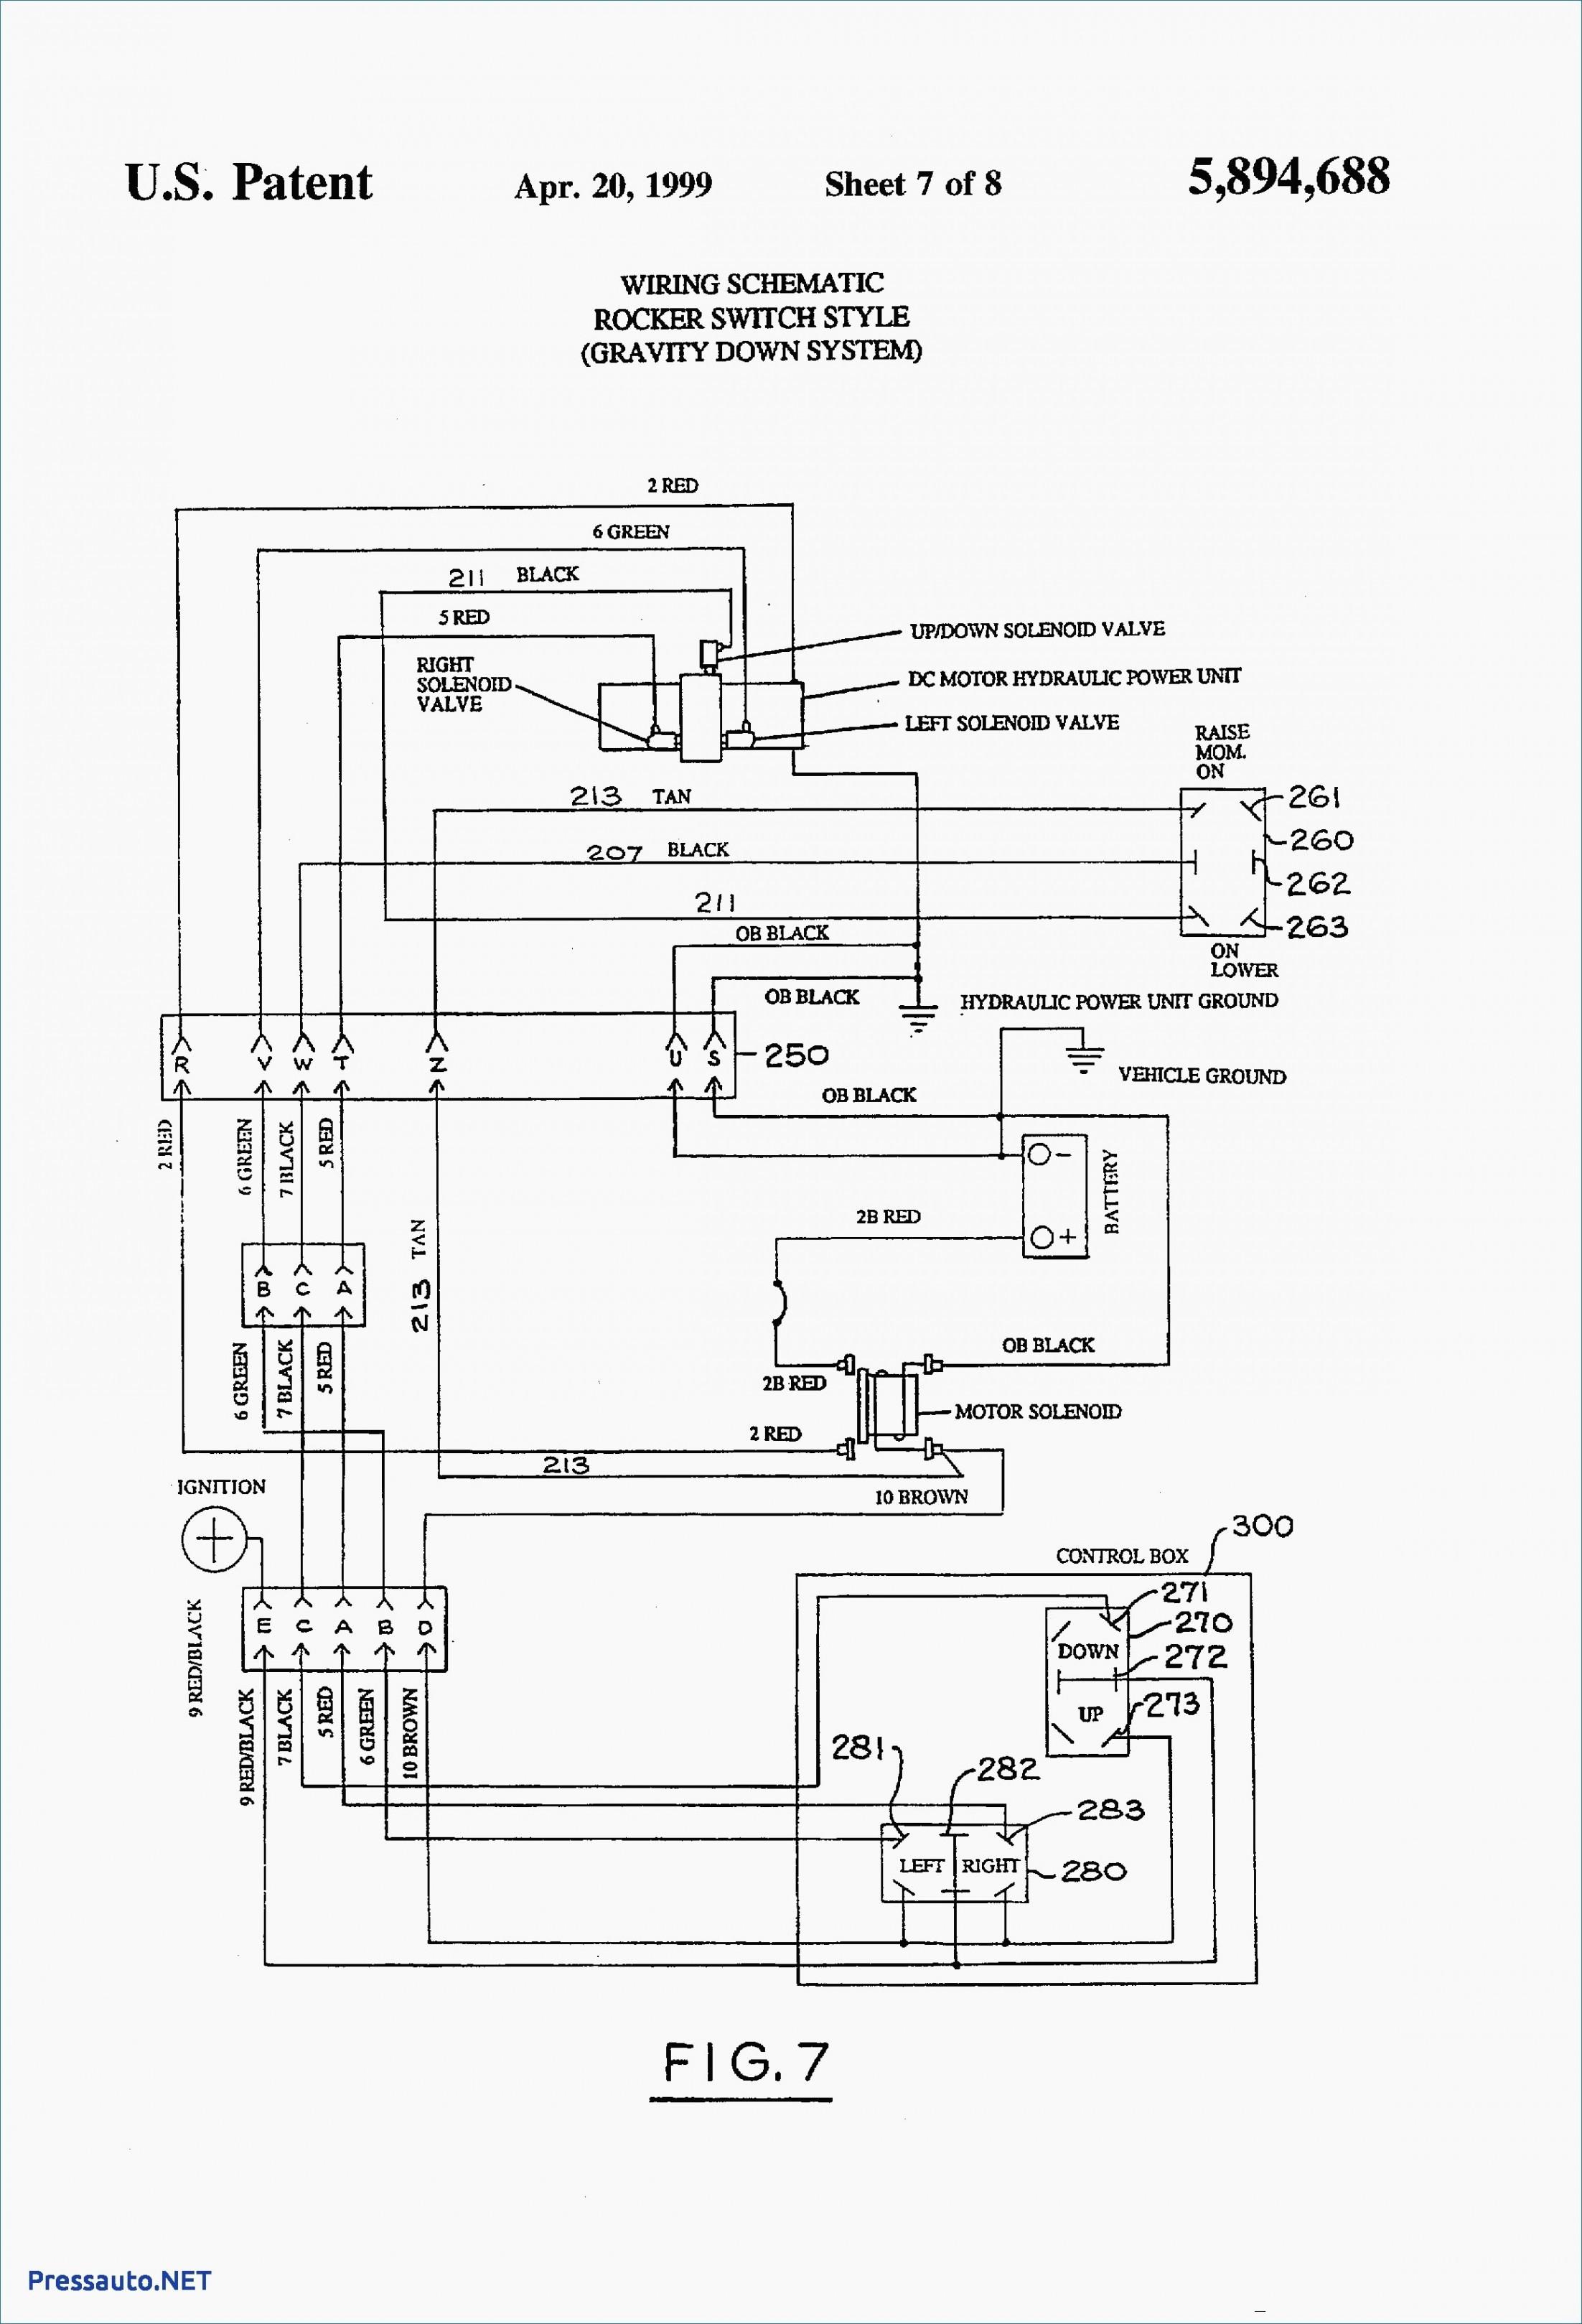 Western Unimount Plow Wiring Diagram | Wiring Diagram - Western Unimount Plow Wiring Diagram